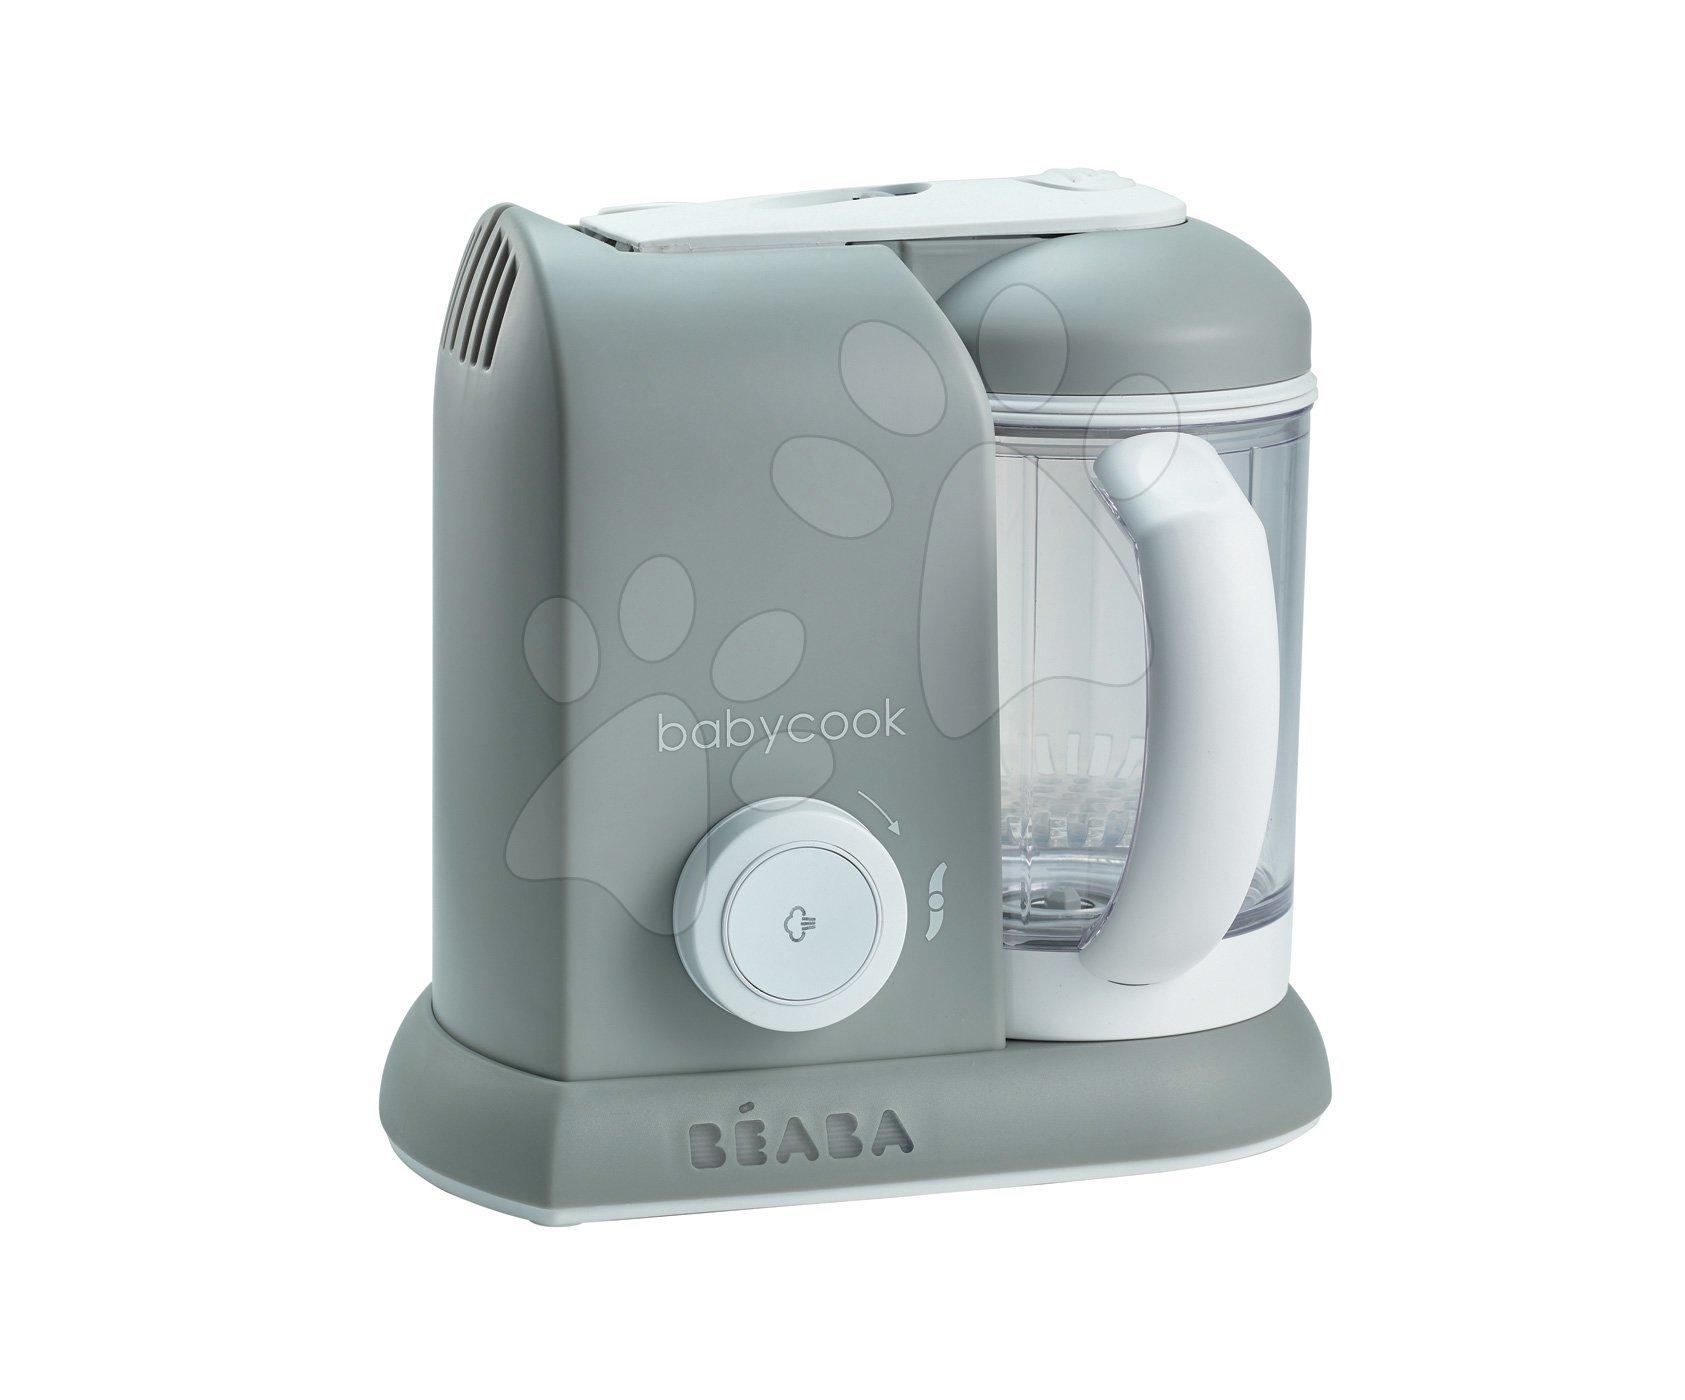 Beaba parný varič a mixér Babycook® Solo 912461 šedý